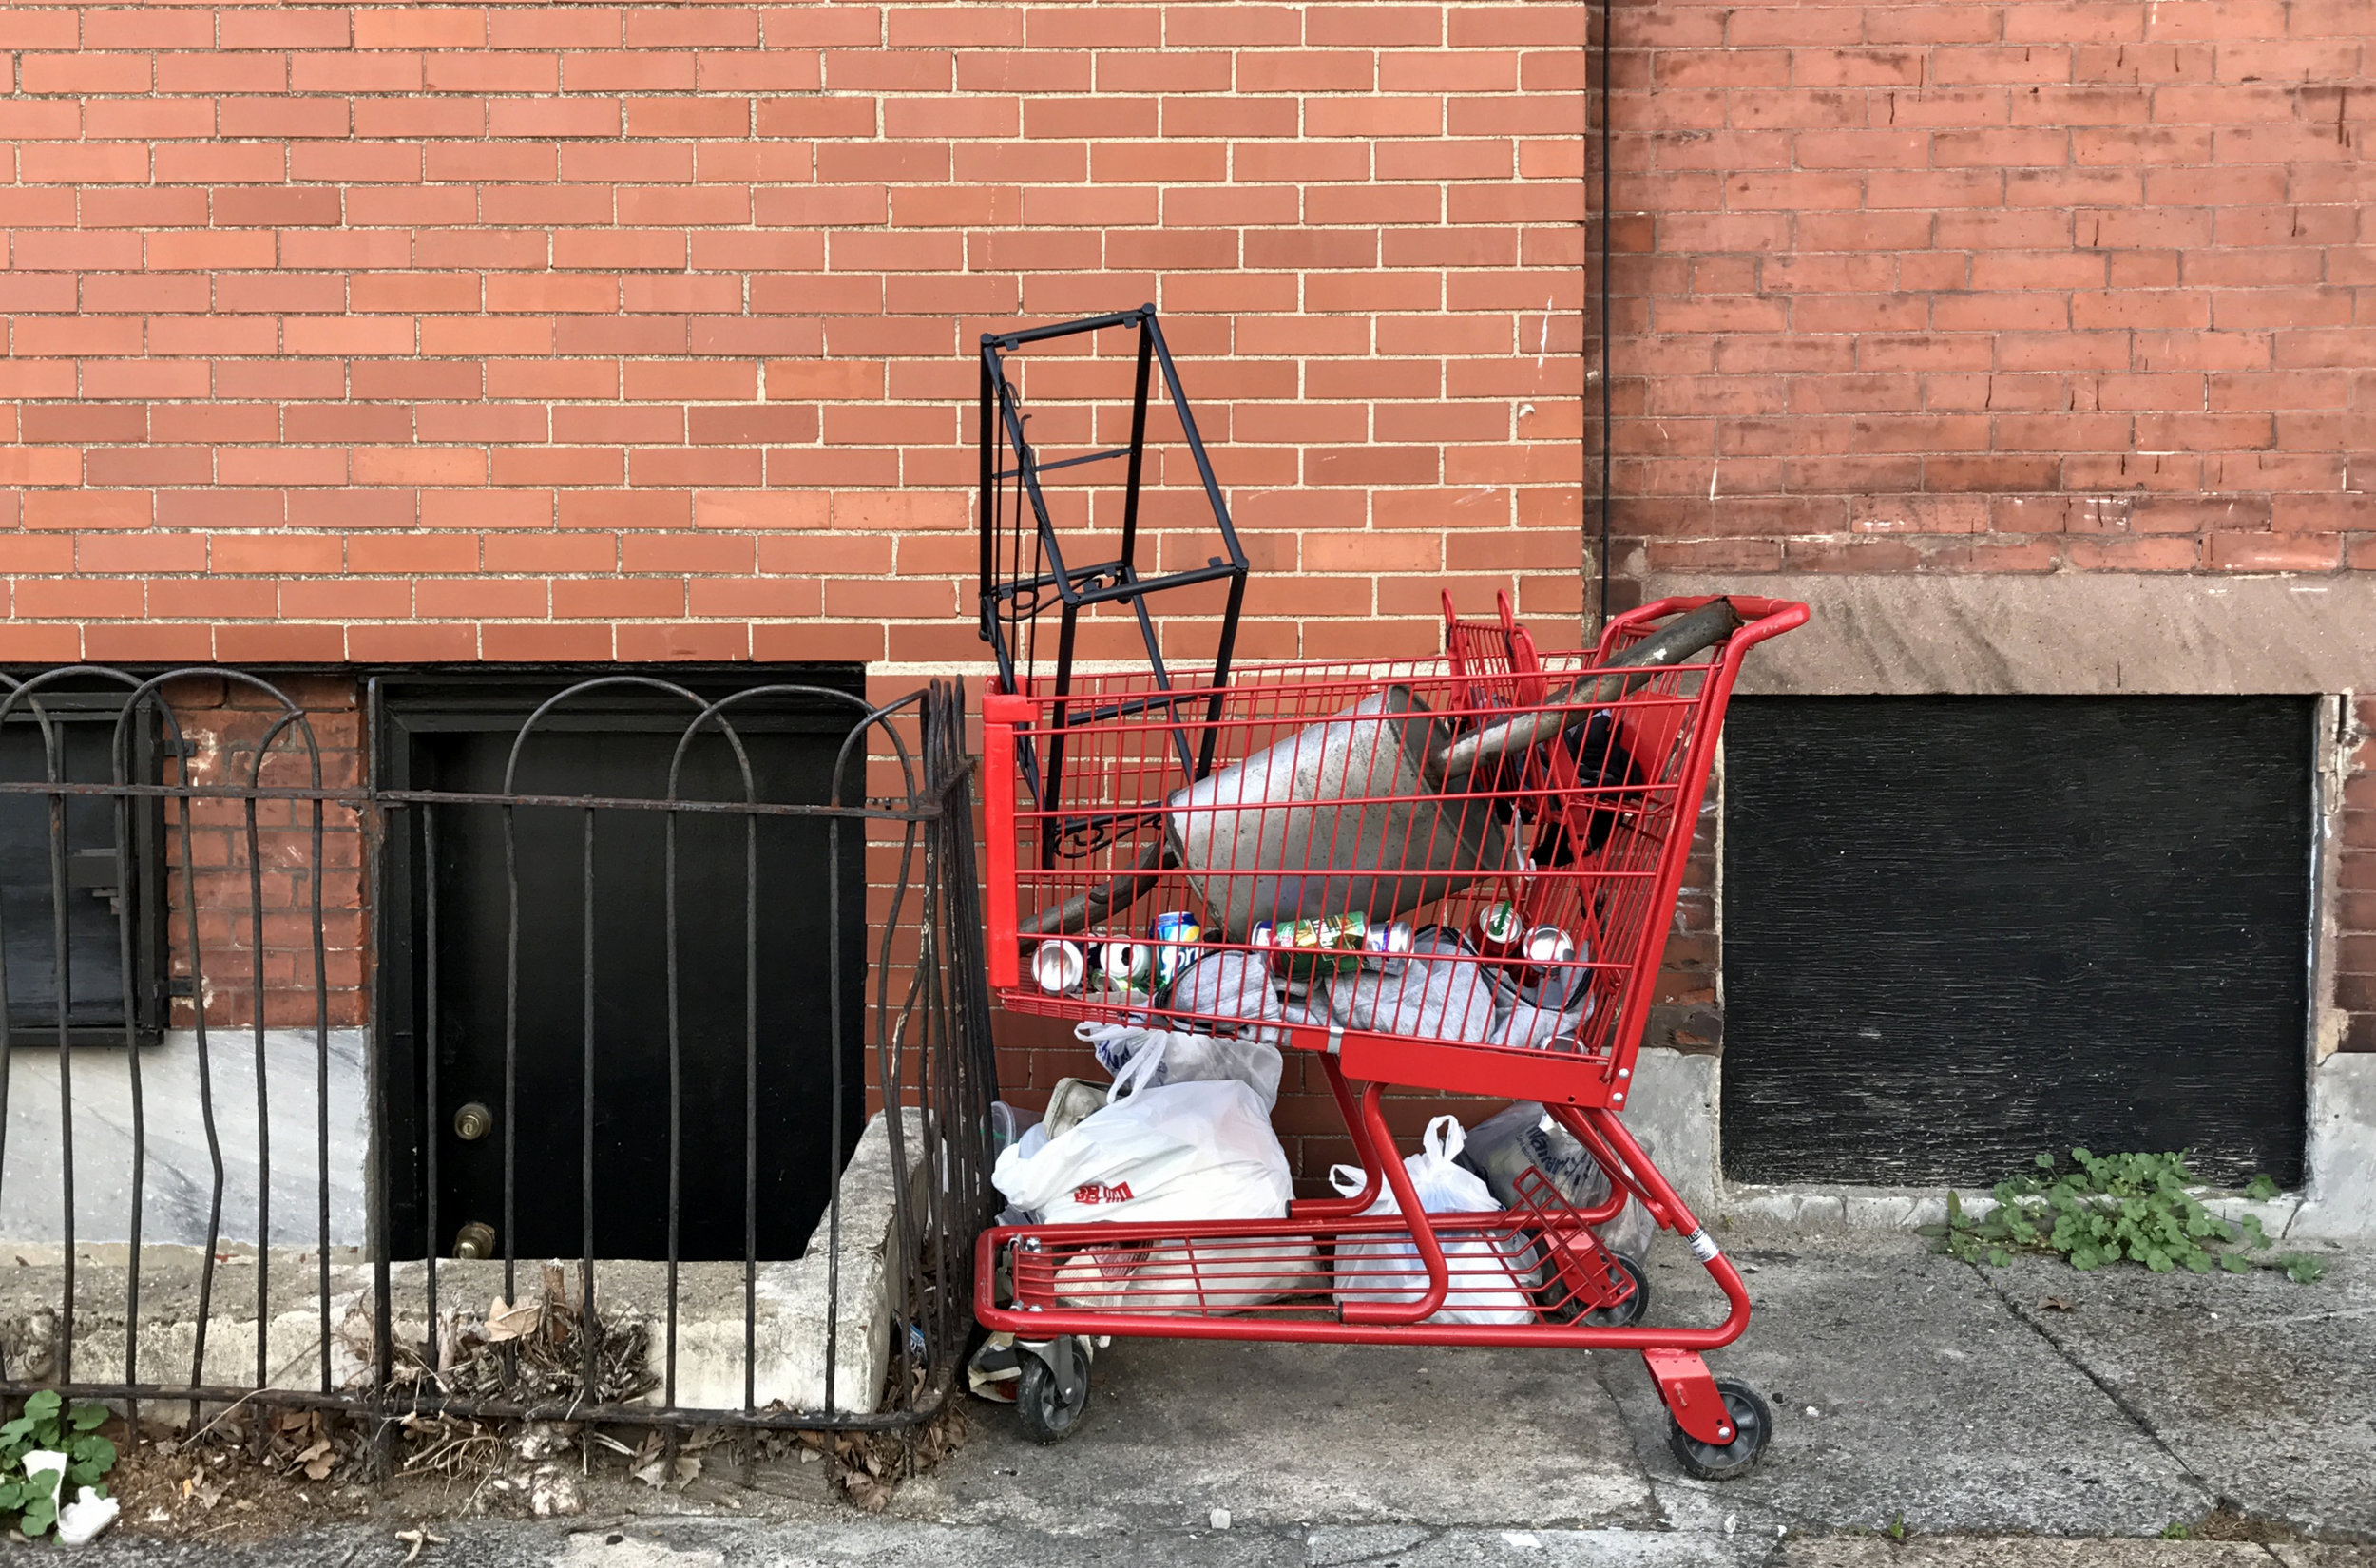 Junkyard Jawn, Philadelphia, PA